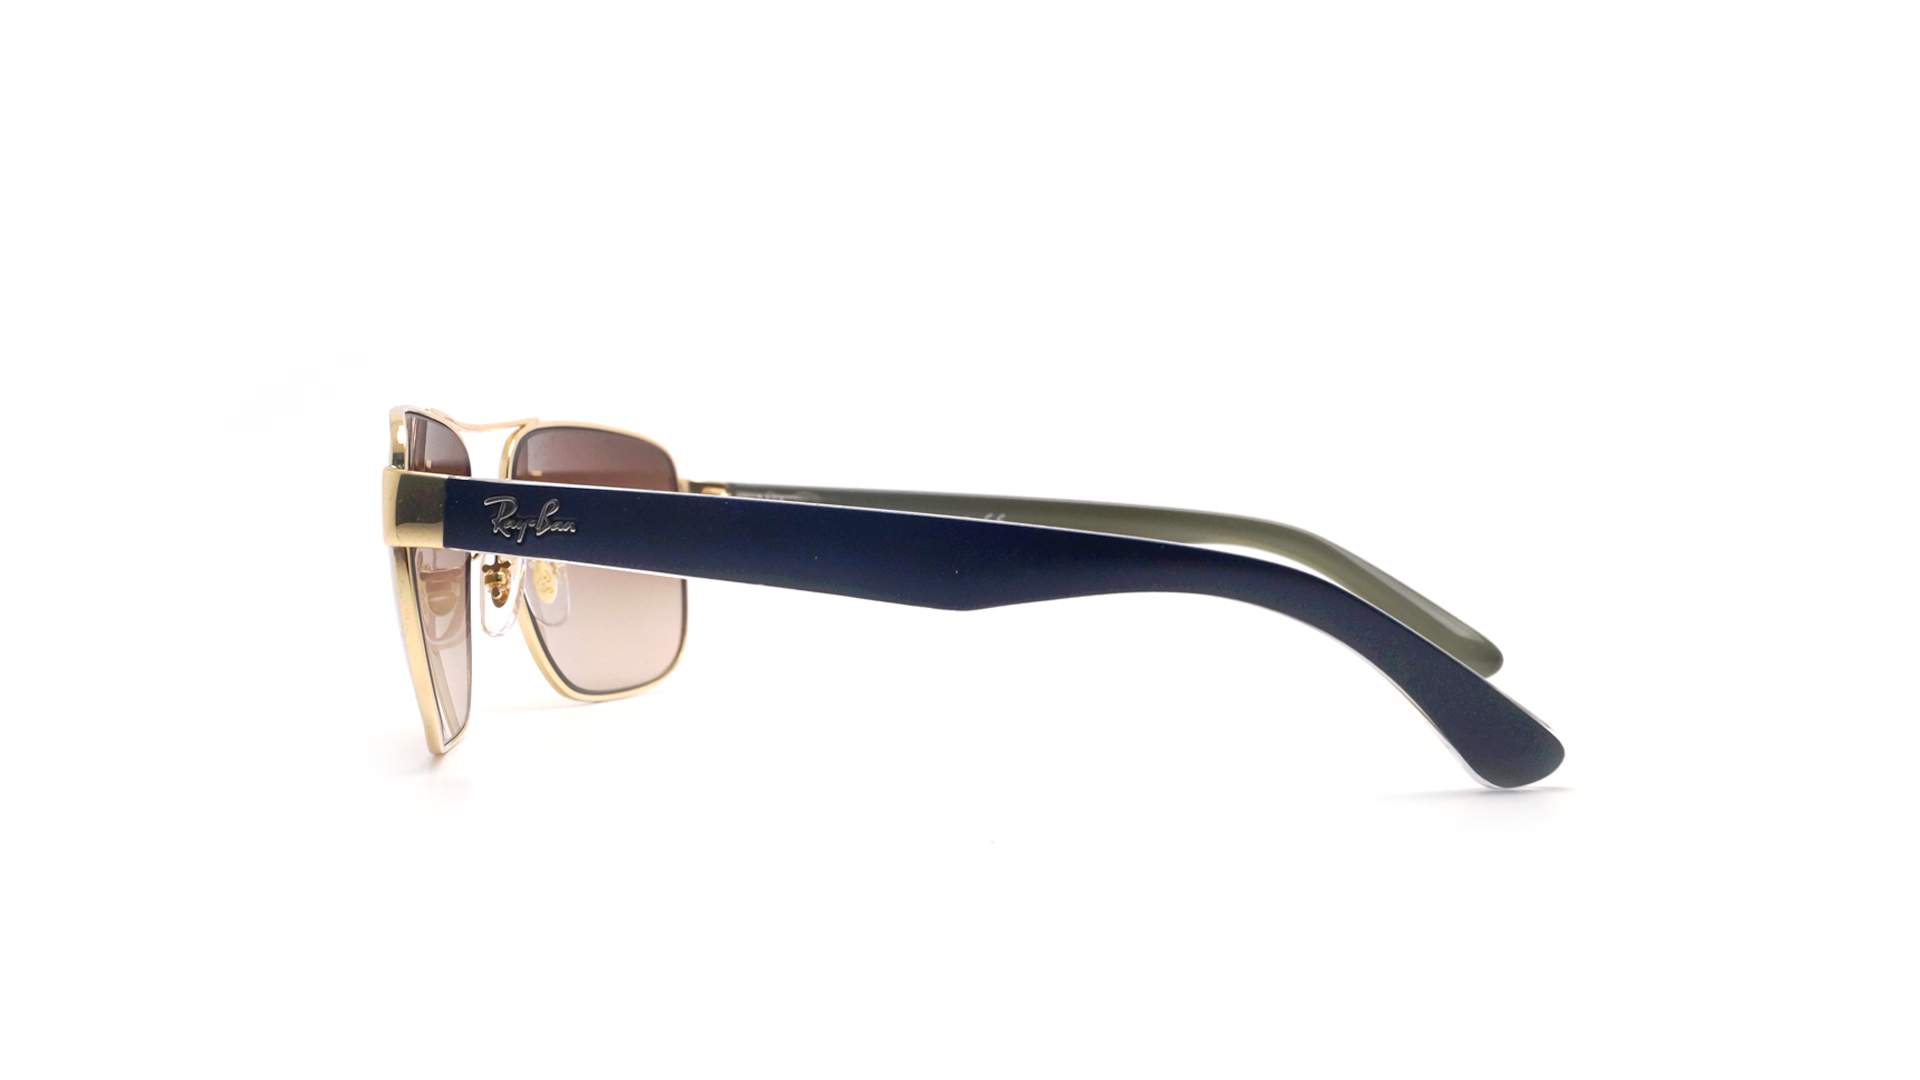 2ac34d0245e Sunglasses Ray-Ban RB3530 001 13 58-13 Gold Medium Gradient